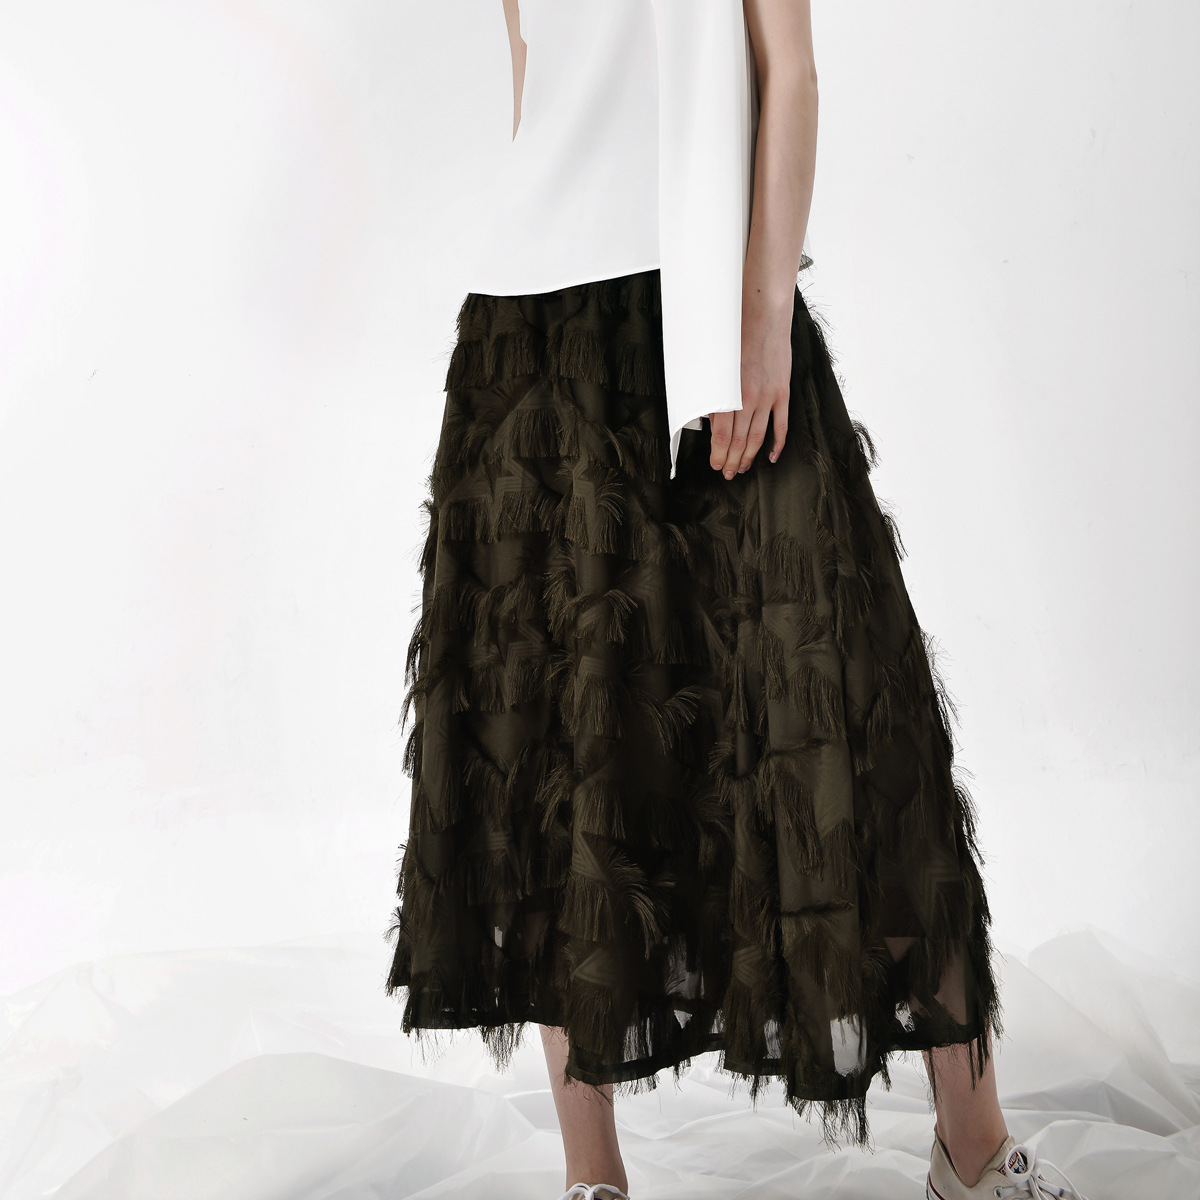 2018 Elastic woman skirts long Elastic Elegant Fringes Saias Longas Casuais Faldas Mujer Falda Saias Na Altura Do Joelho